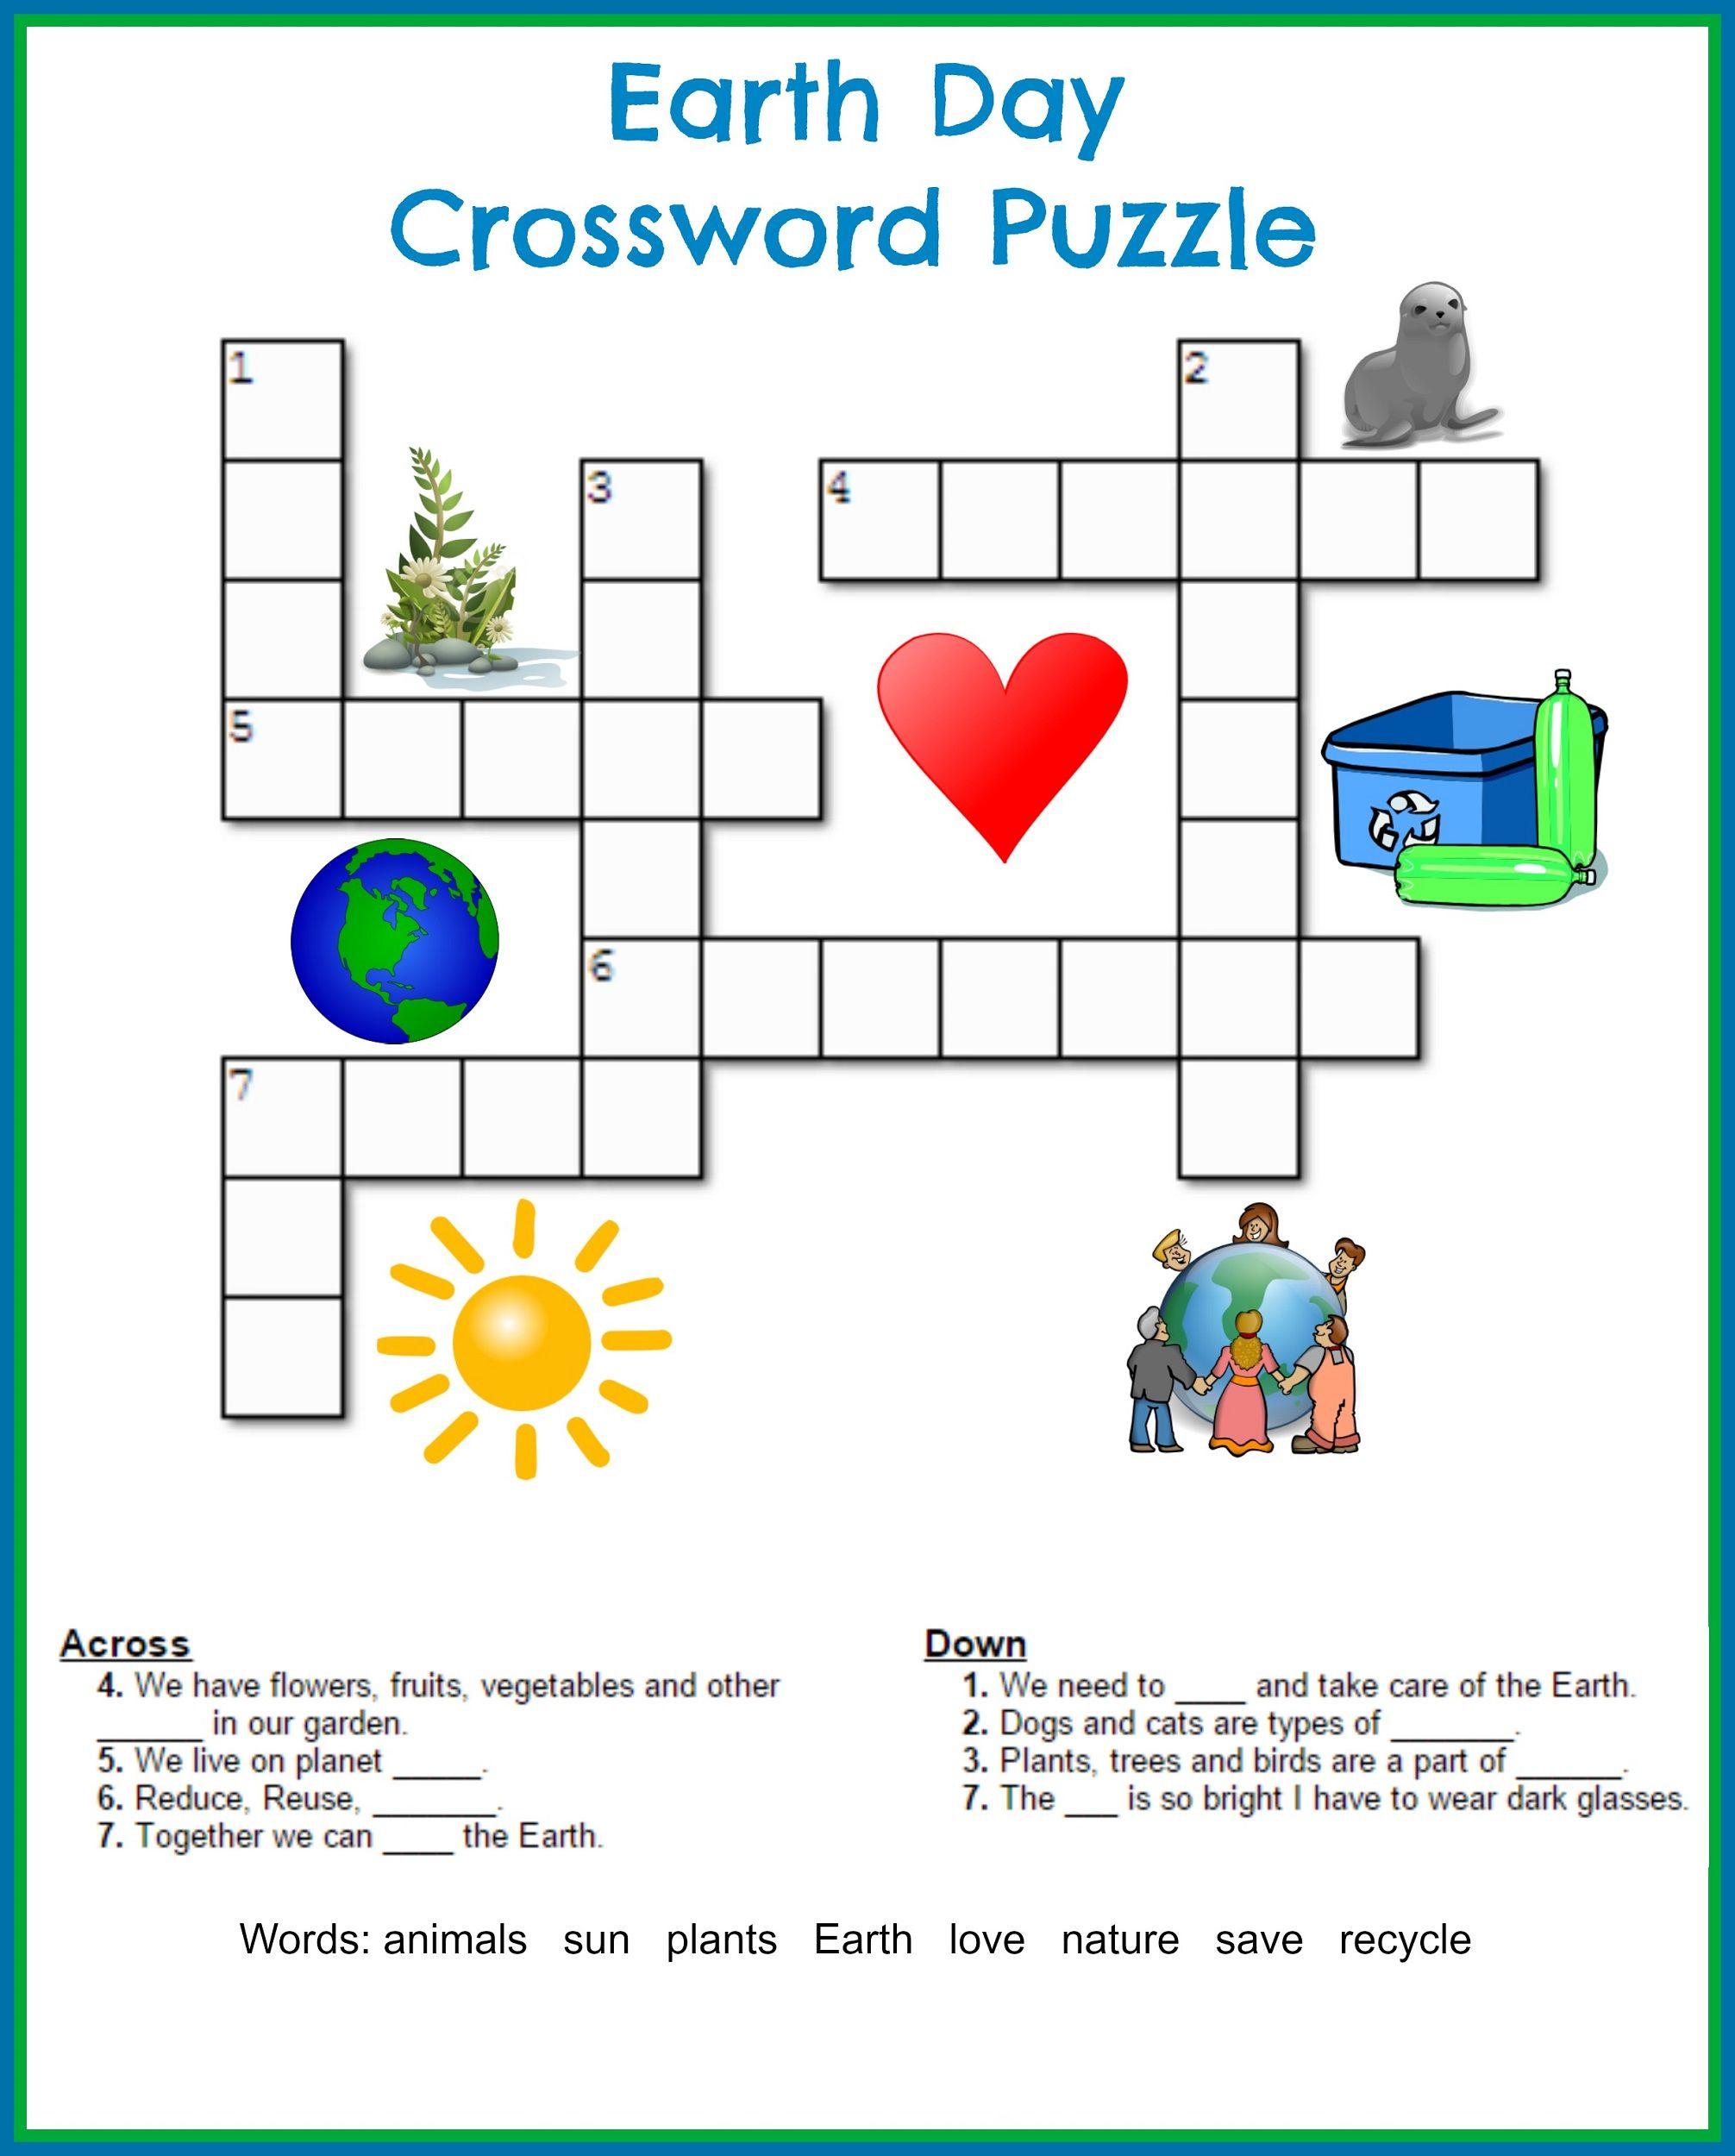 Printable Crossword Puzzles Kids | Crossword Puzzles On Earth - Printable Educational Crossword Puzzles